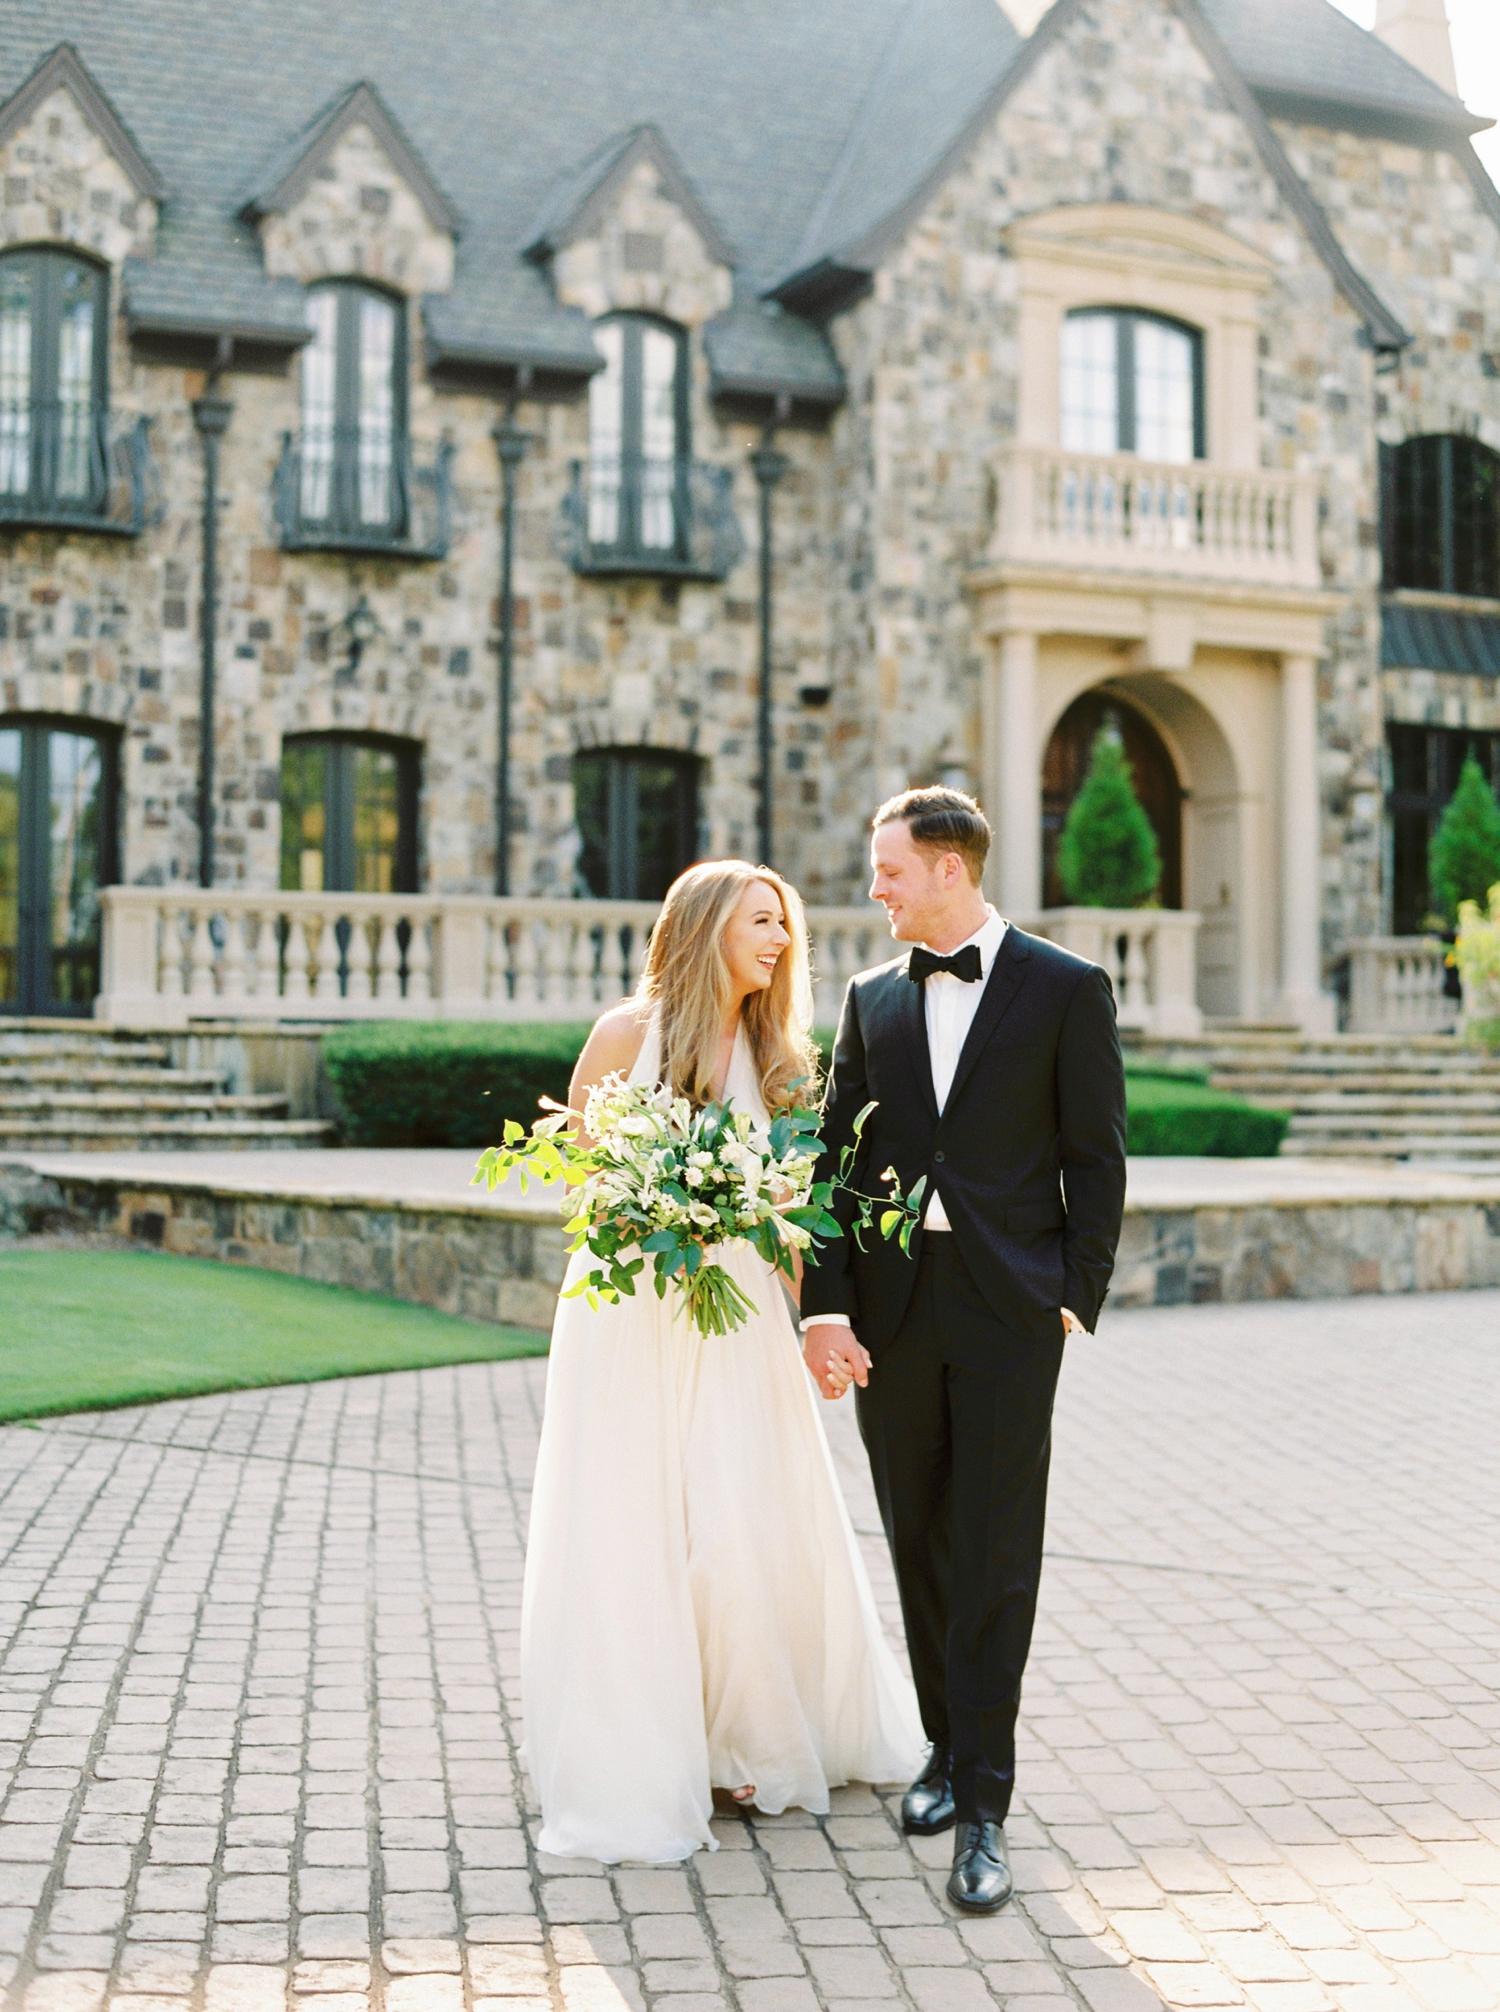 Calgary wedding photographers | georgia wedding photographers | fine art film | Justine Milton Photography | wedding details | georgia wedding | bride and groom portraits | bouquet